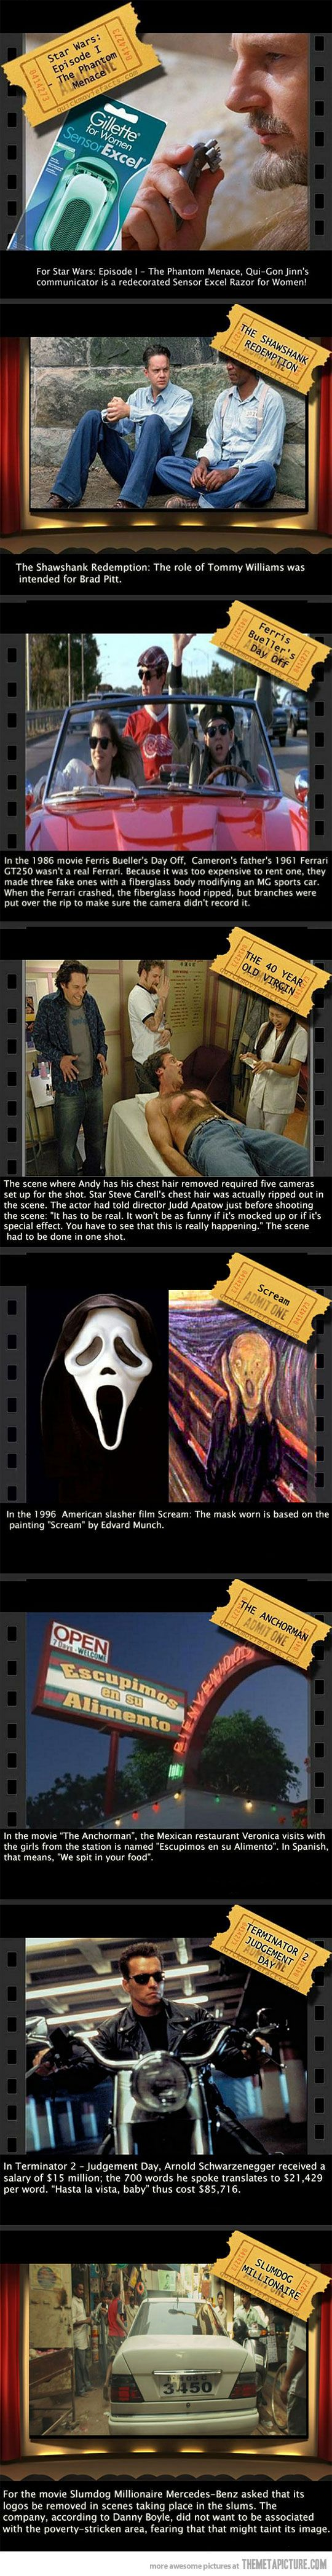 Fun Movie Facts